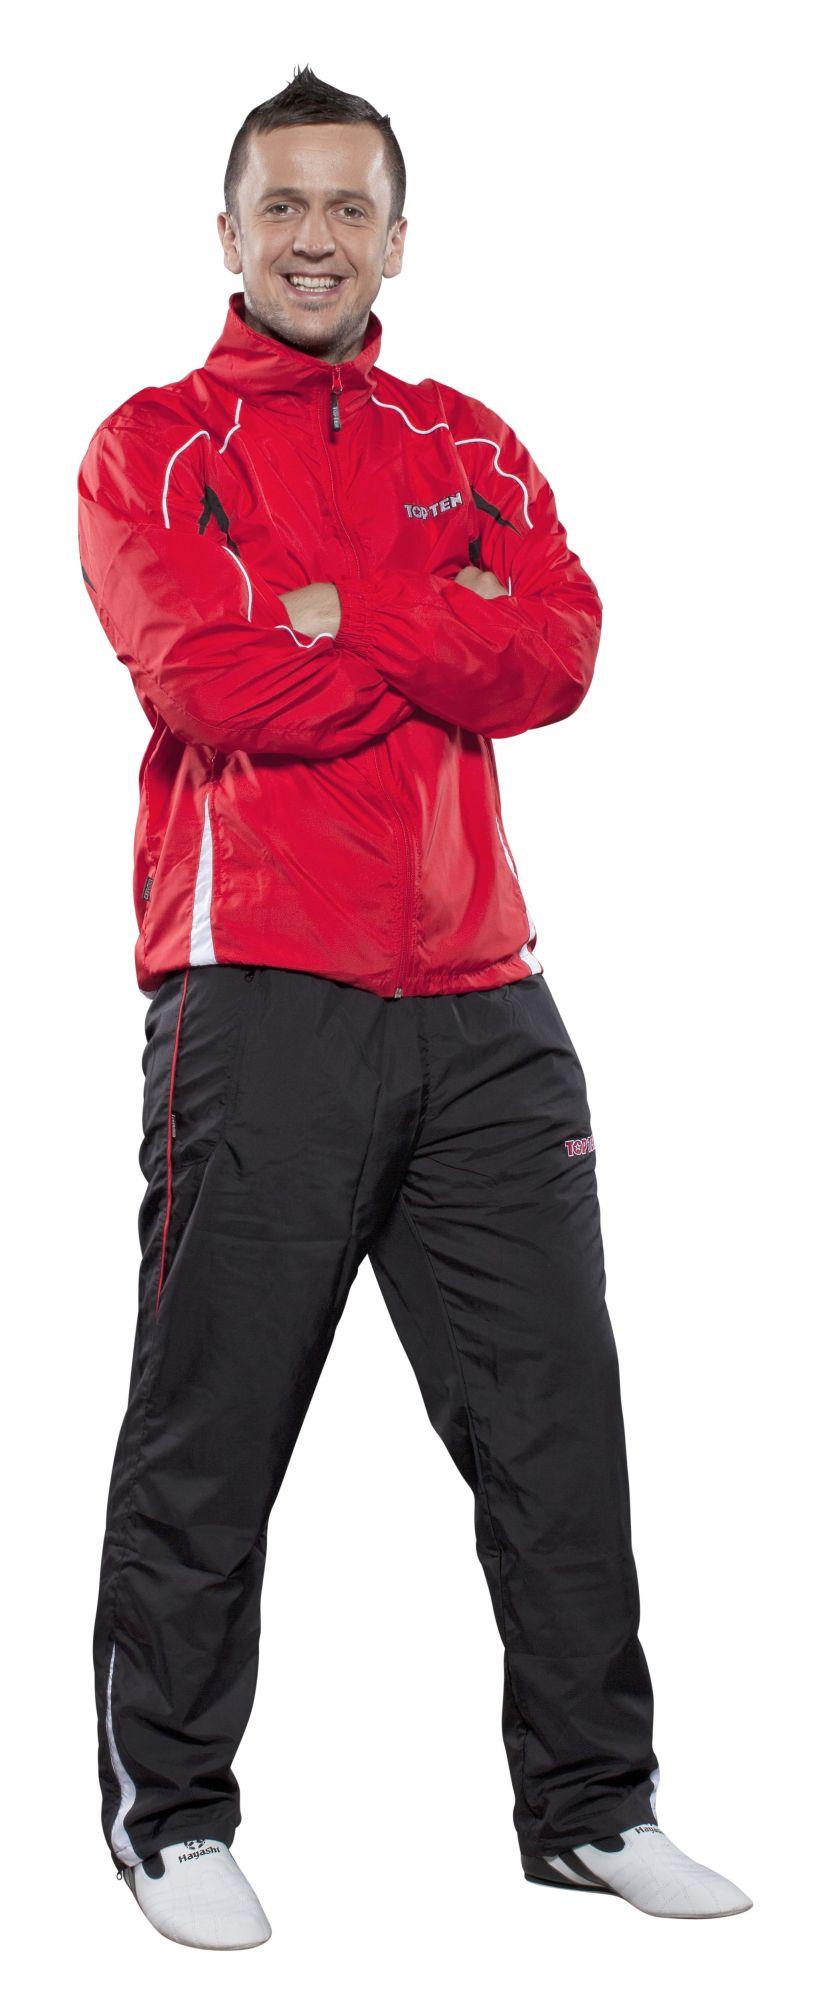 Trainingspak Rood - Zwart